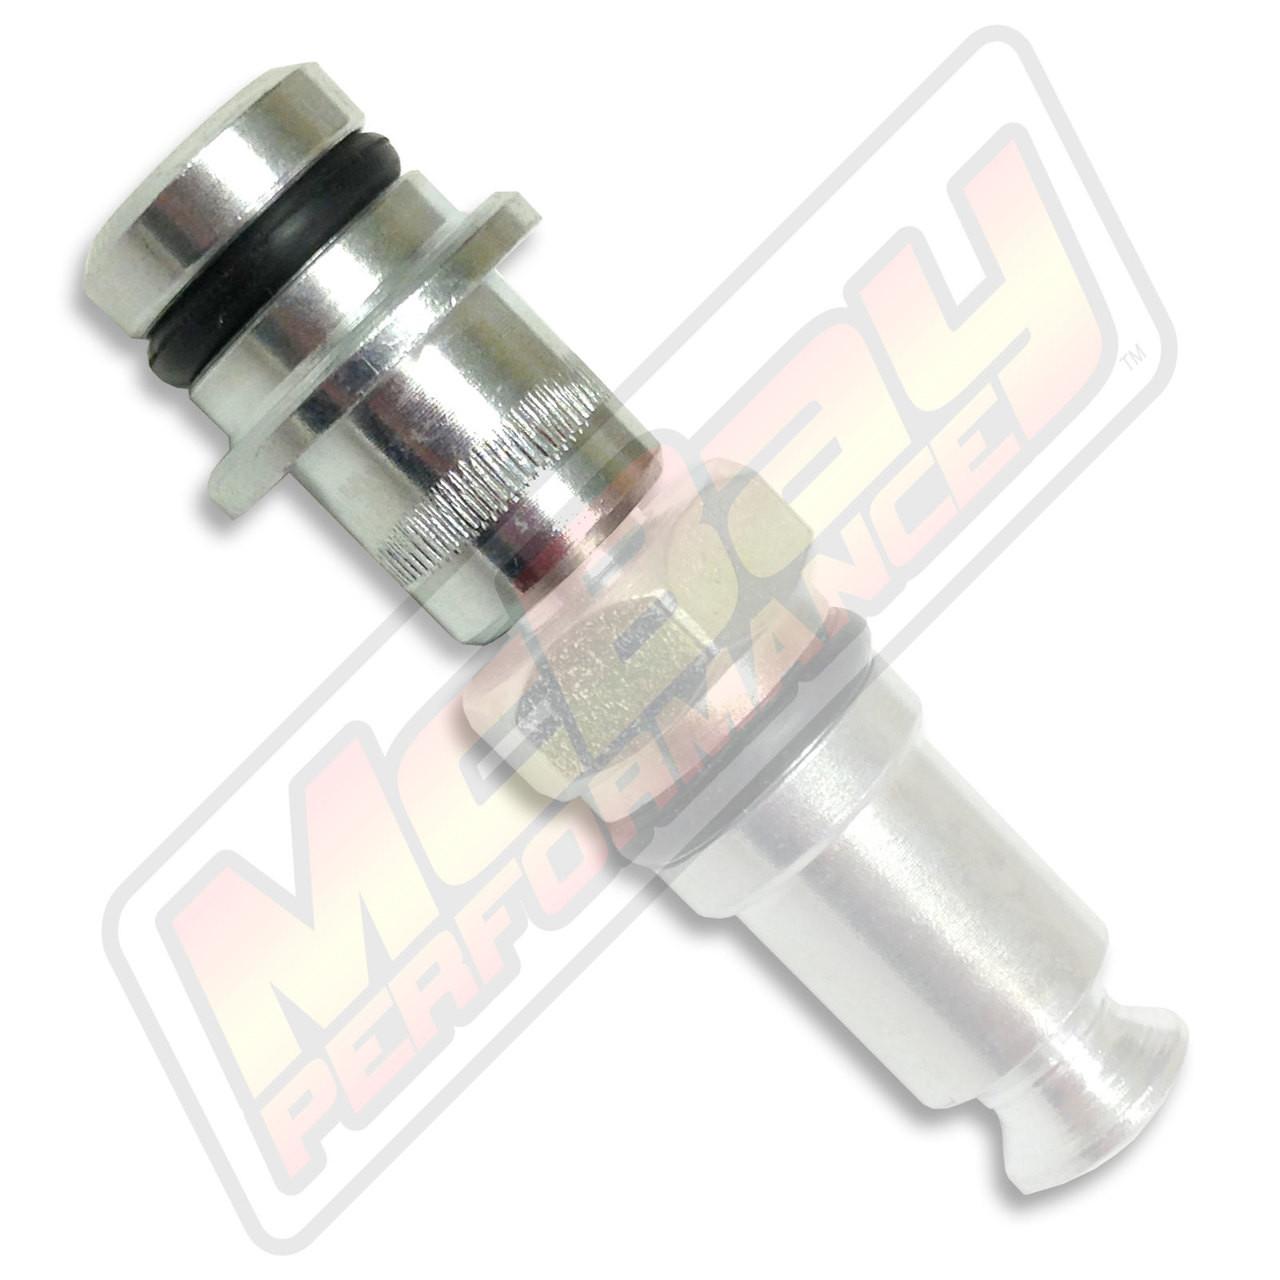 Hunter 41-115-1 Wheel Alignment Adaptor Clamp Threaded  Backing Insert Nut #SP-2